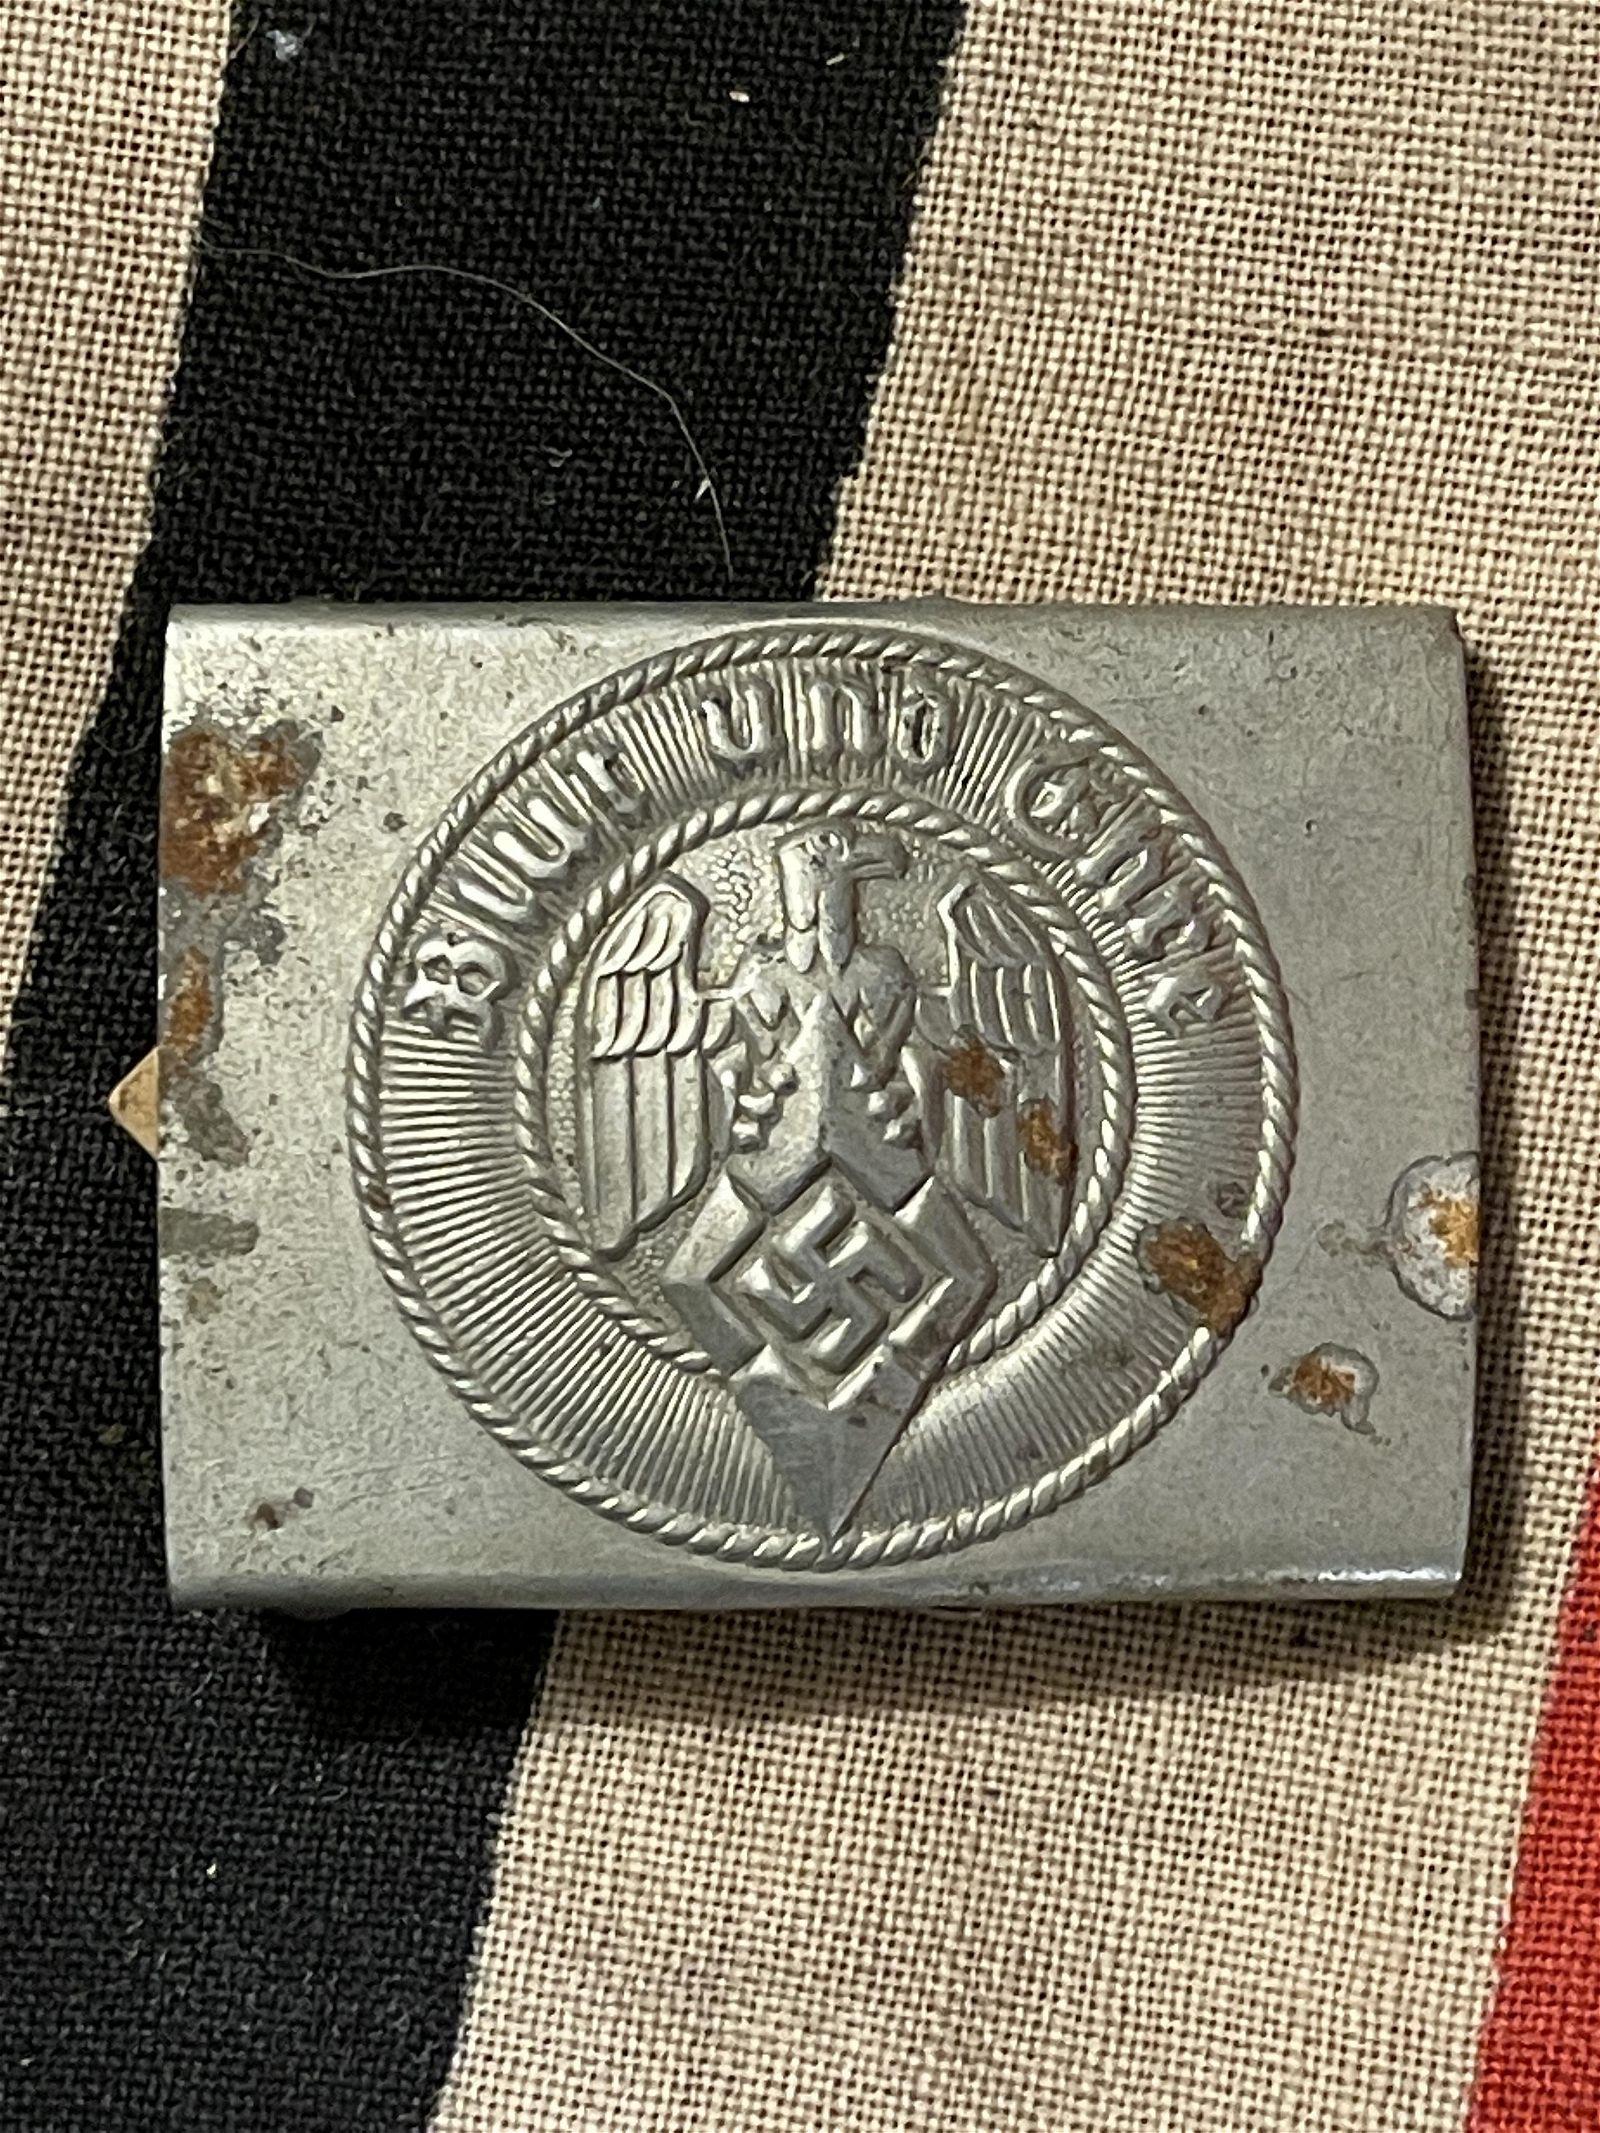 WW2 GERMAN HITLER YOUTH BELT BUCKLE W/ORIG. TAG